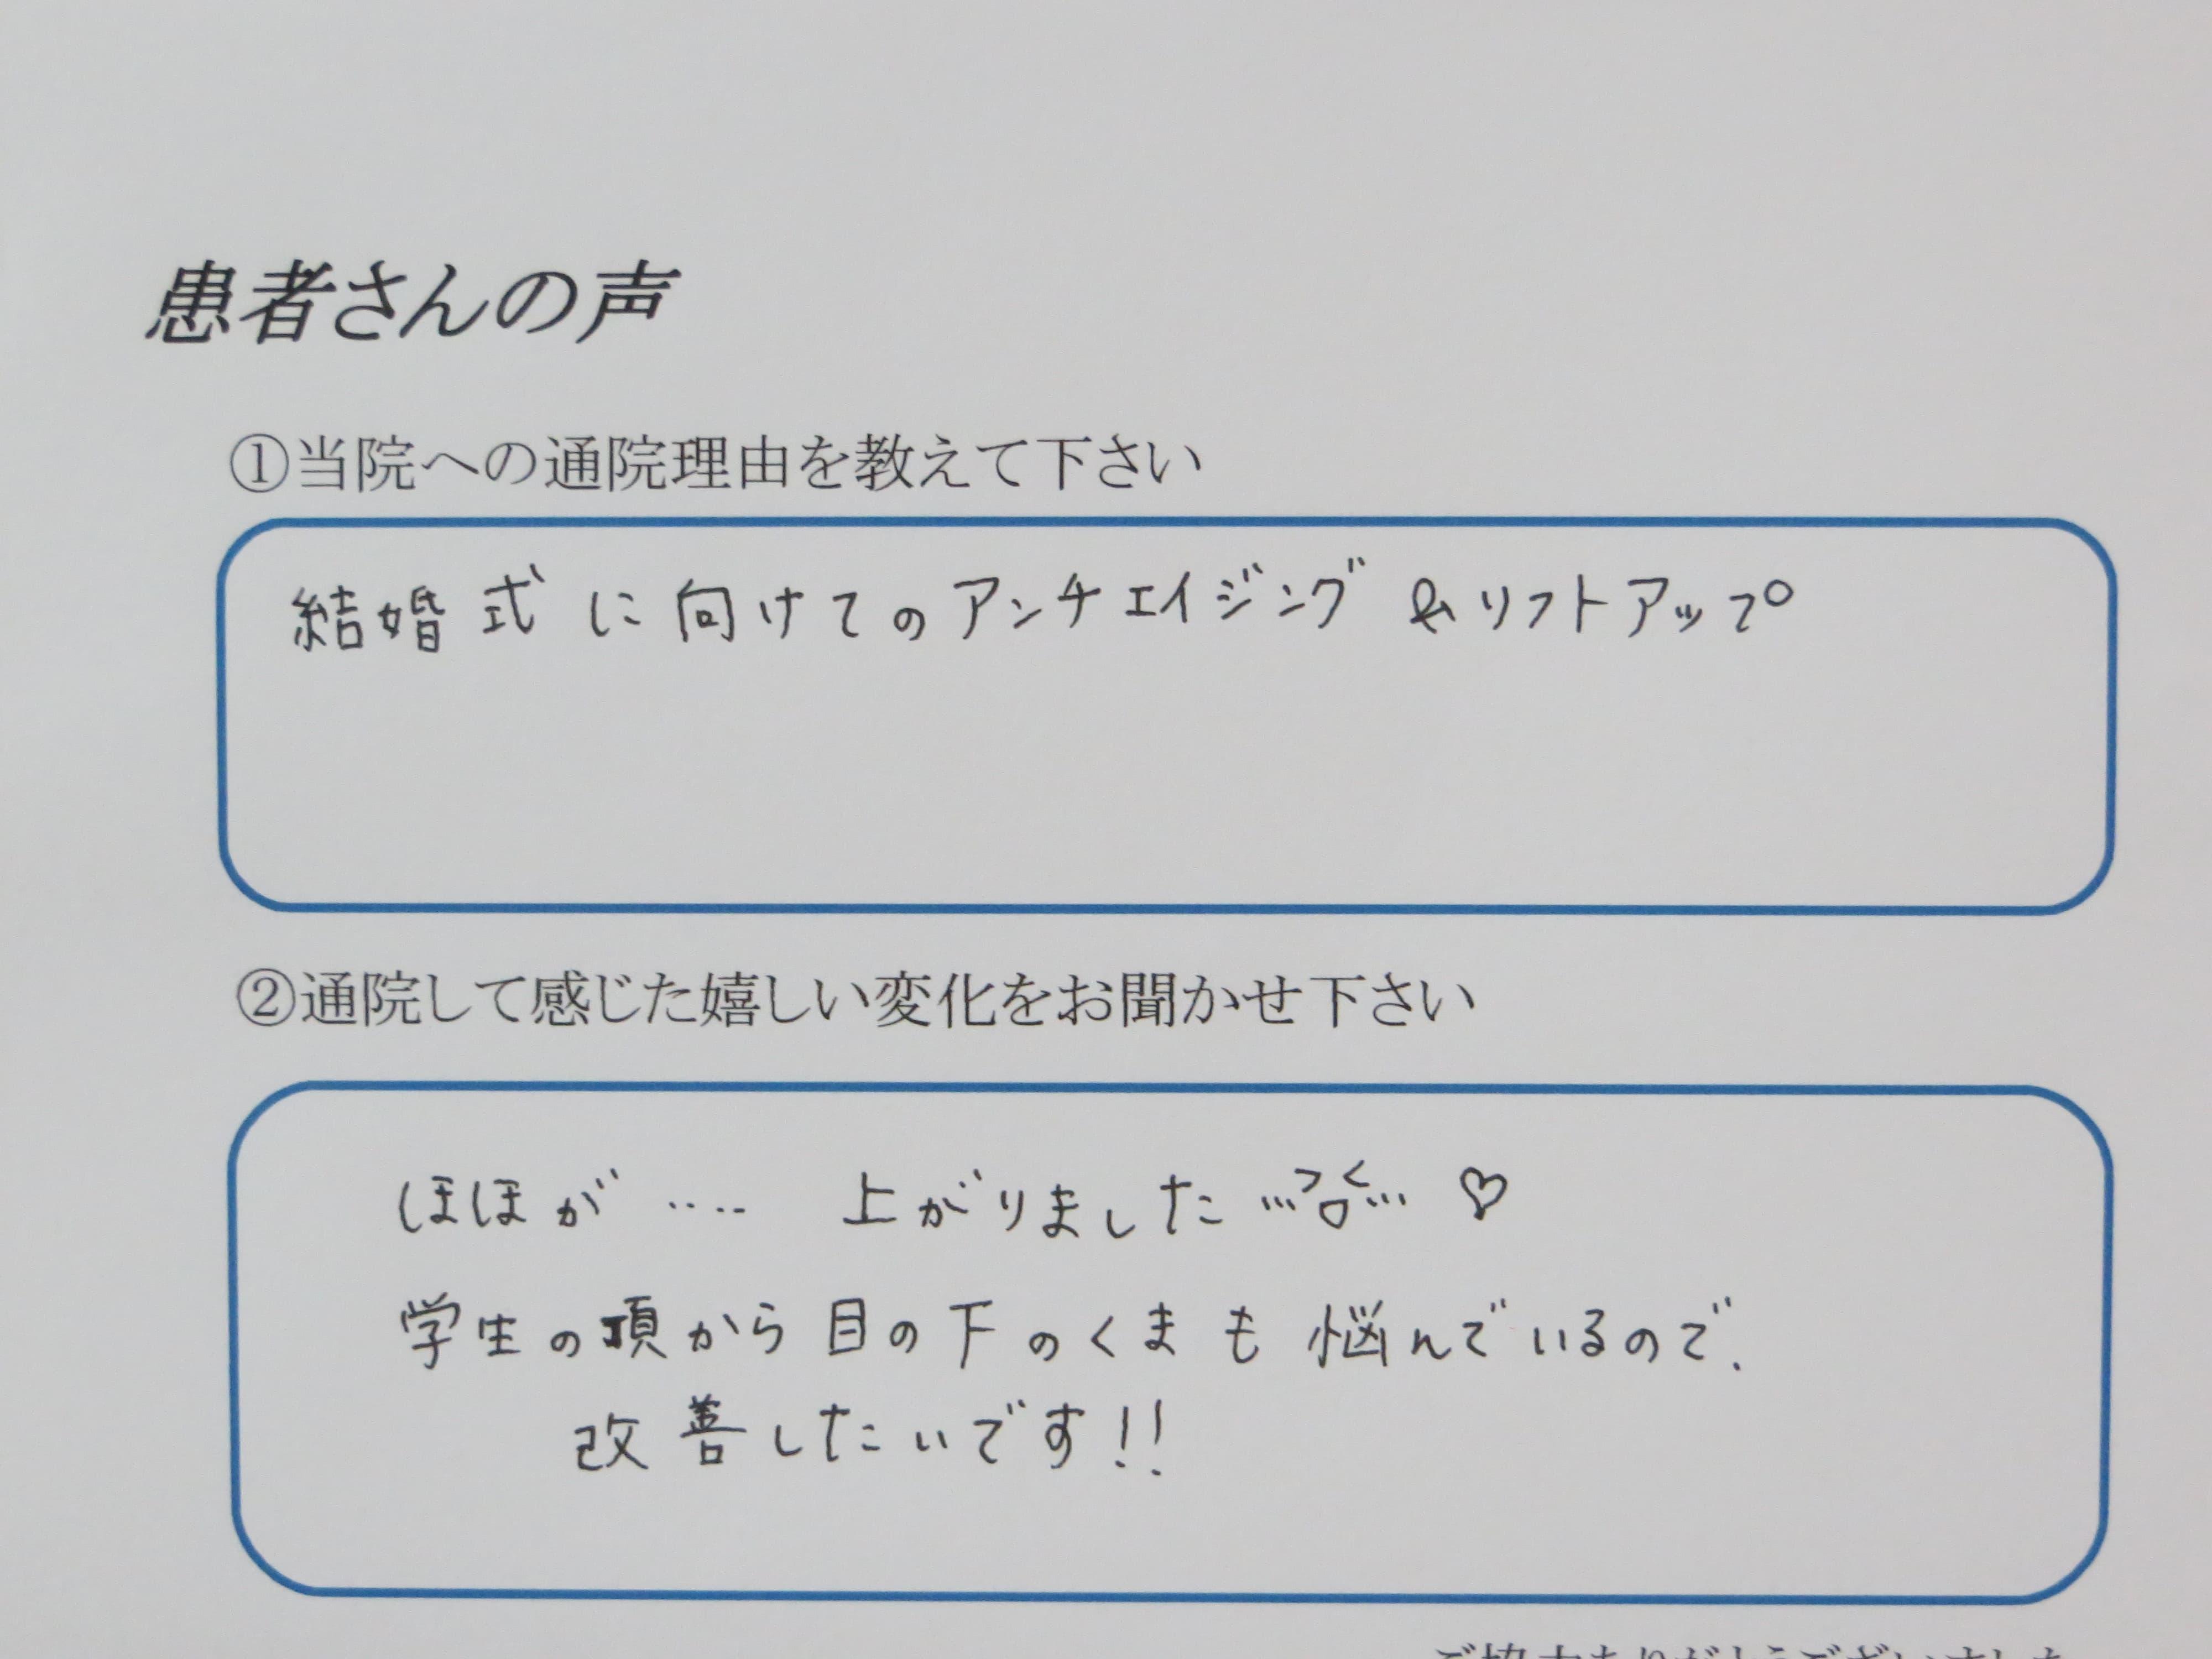 IMG_1979.JPG M様 アンチエイジング